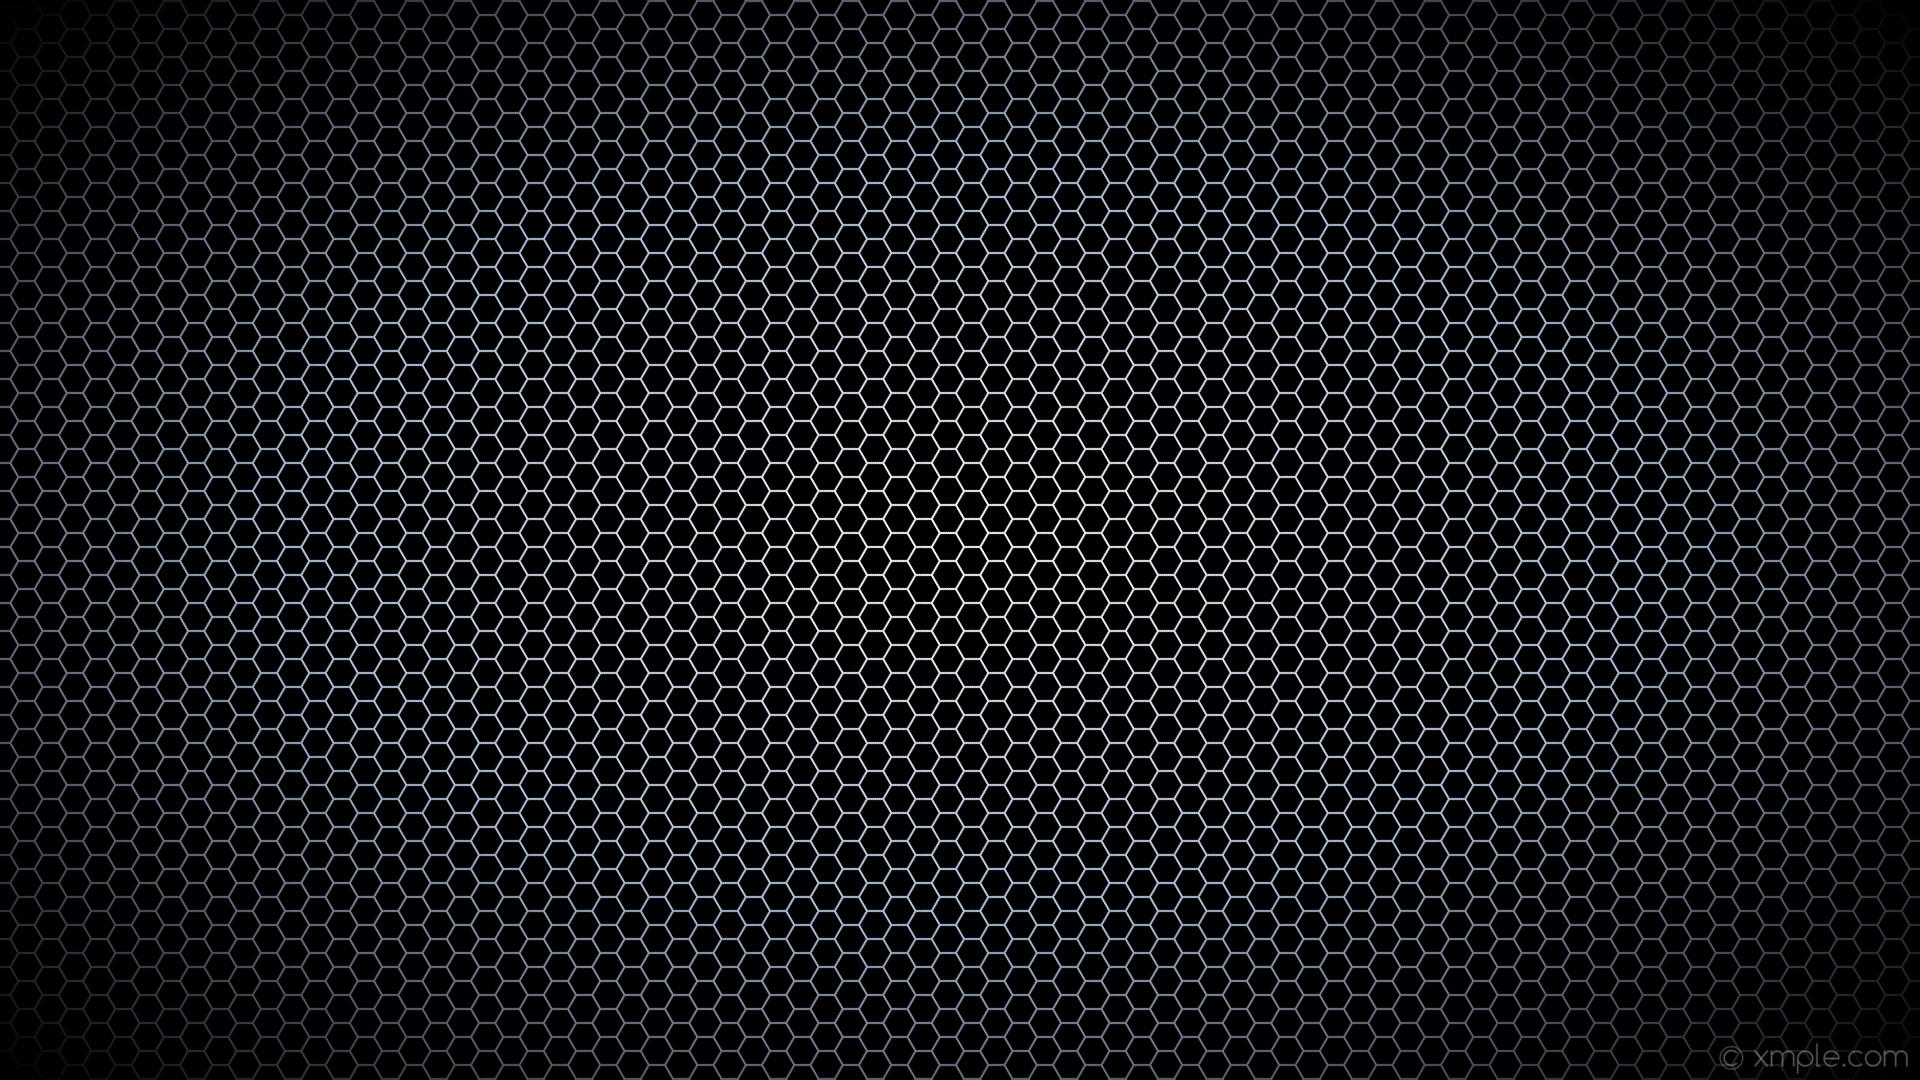 wallpaper black hexagon glow white blue gradient light steel blue #000000  #ffffff #b0c4de